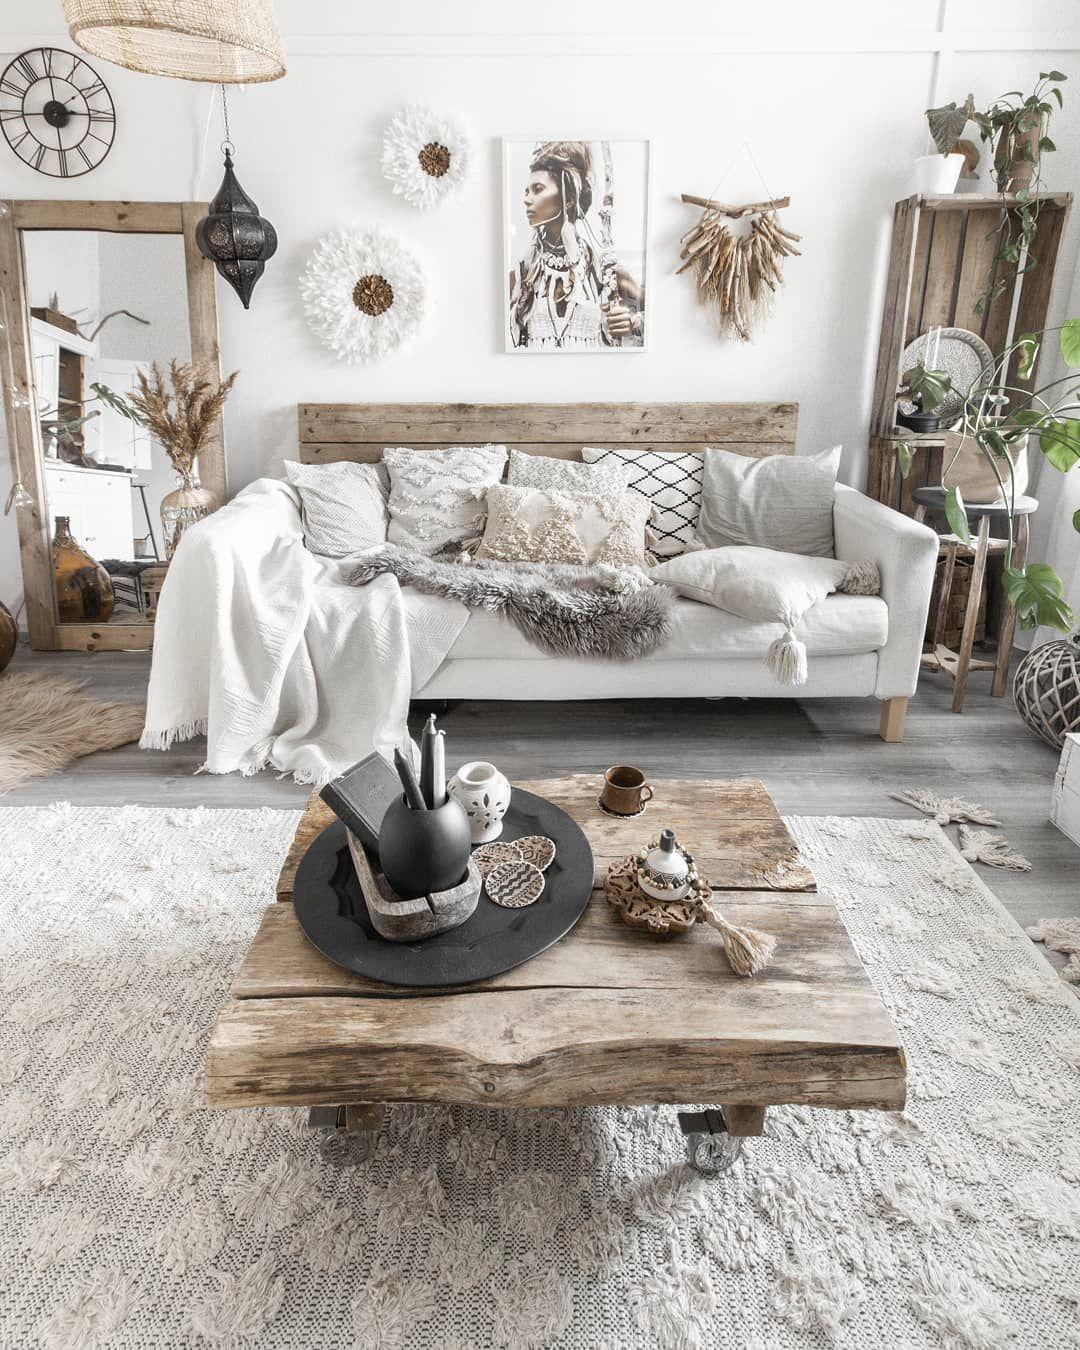 Rustic Scandiboho On Instagram Oh It Already Feels Like Summer Here In Finland I Was Just Interior Design Living Room Living Room Designs Boho Living Room